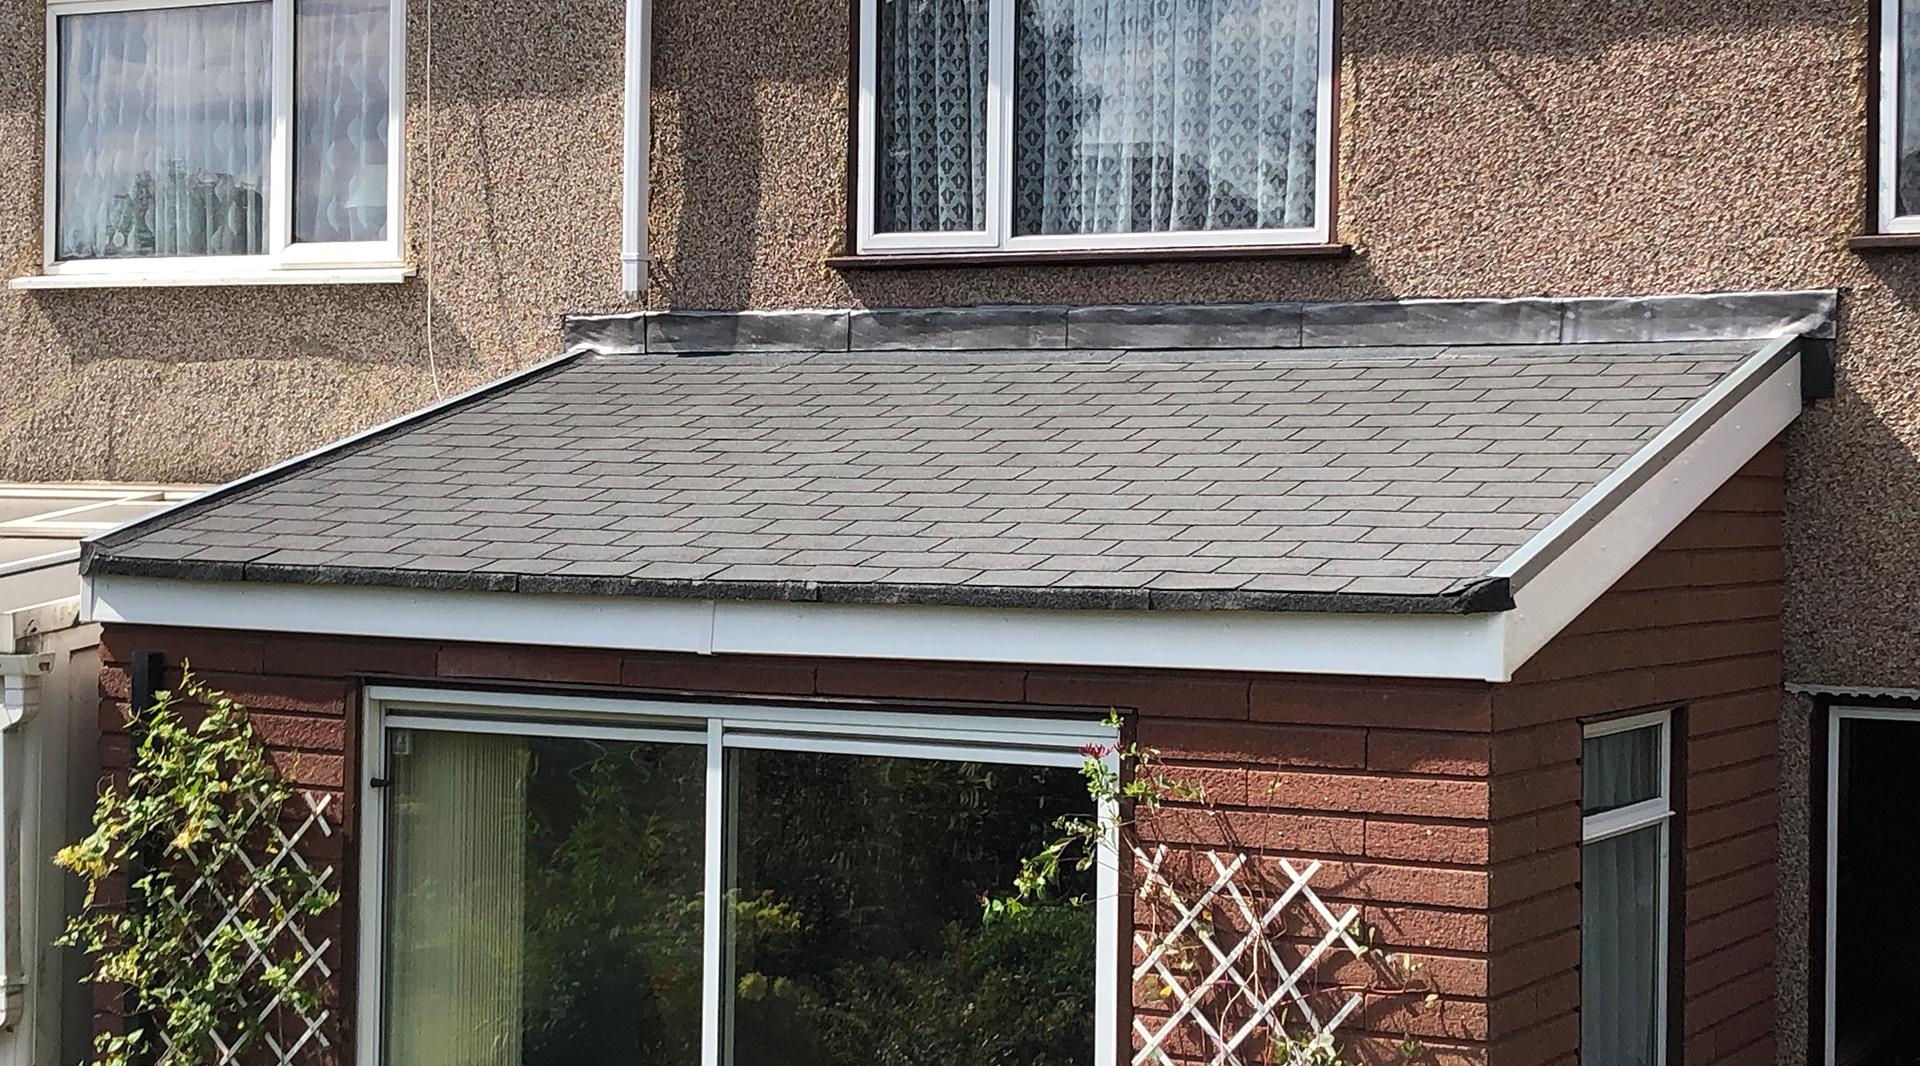 Felt Roof, felt shingles, felt tiles, shed tiles, kent roofing services, rochester, medway kent